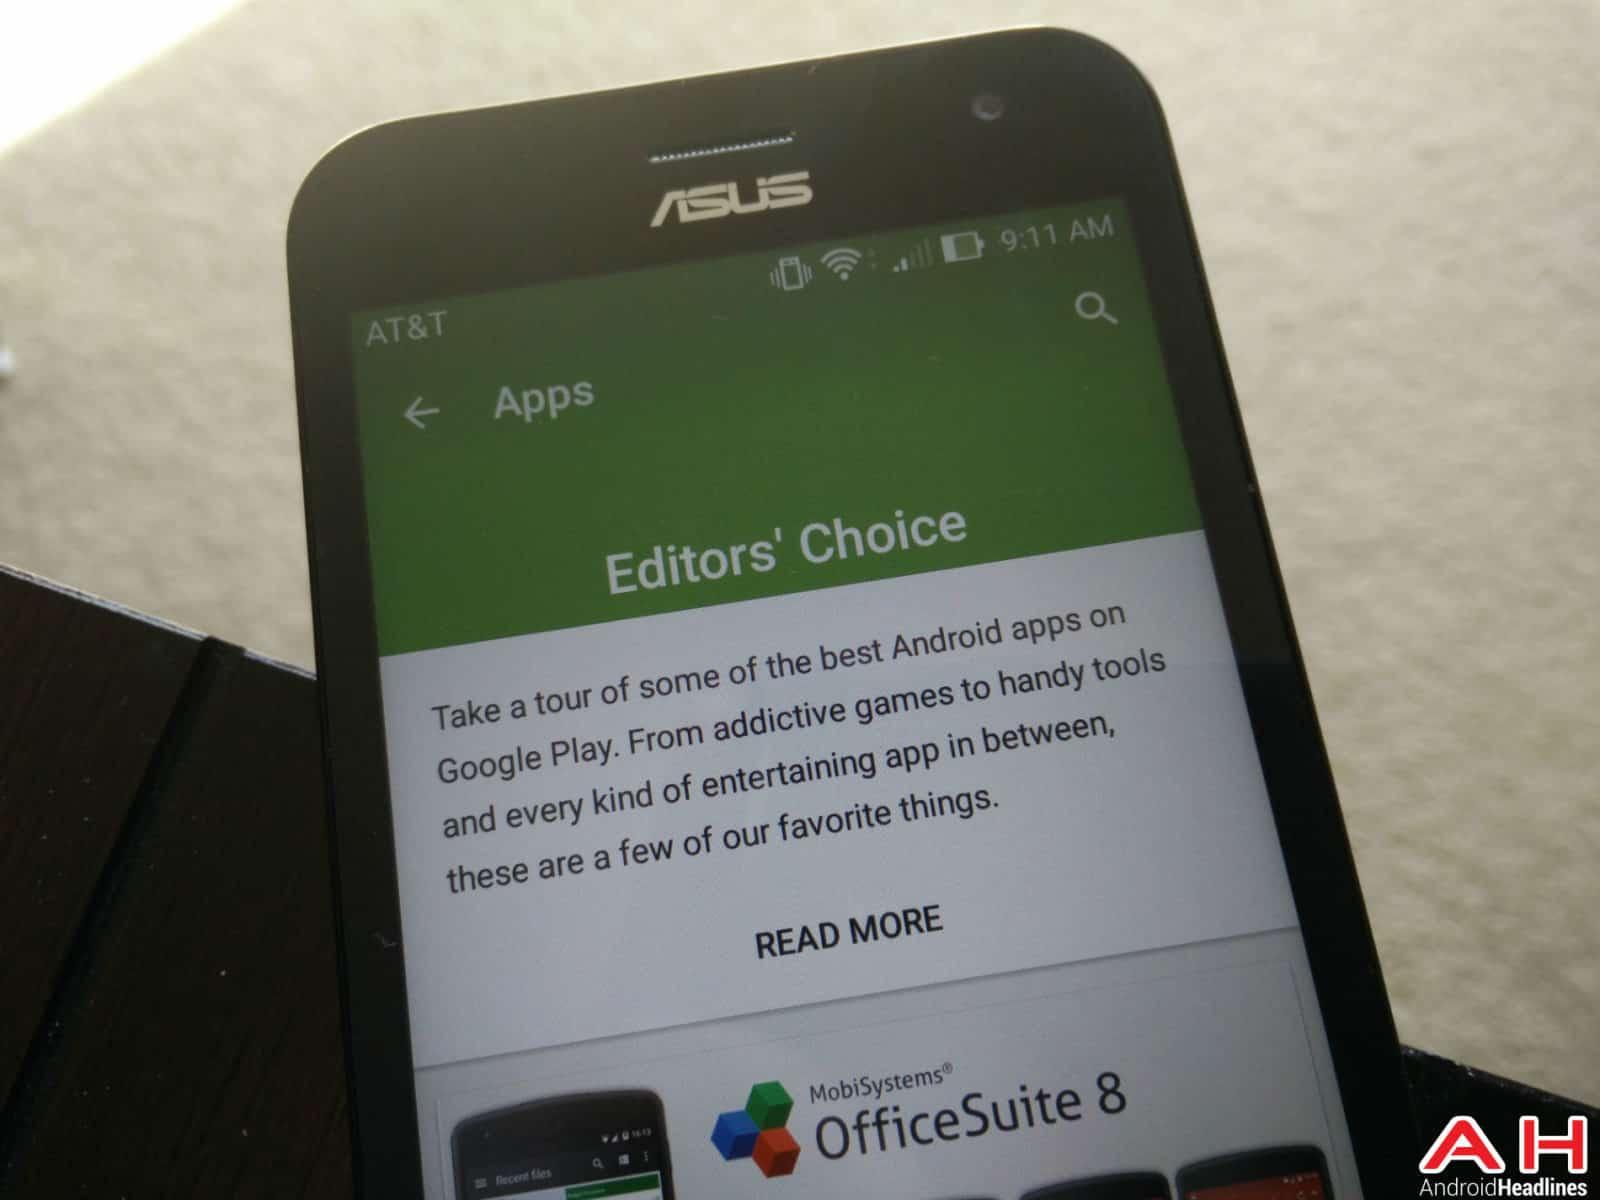 Apps Editor AH